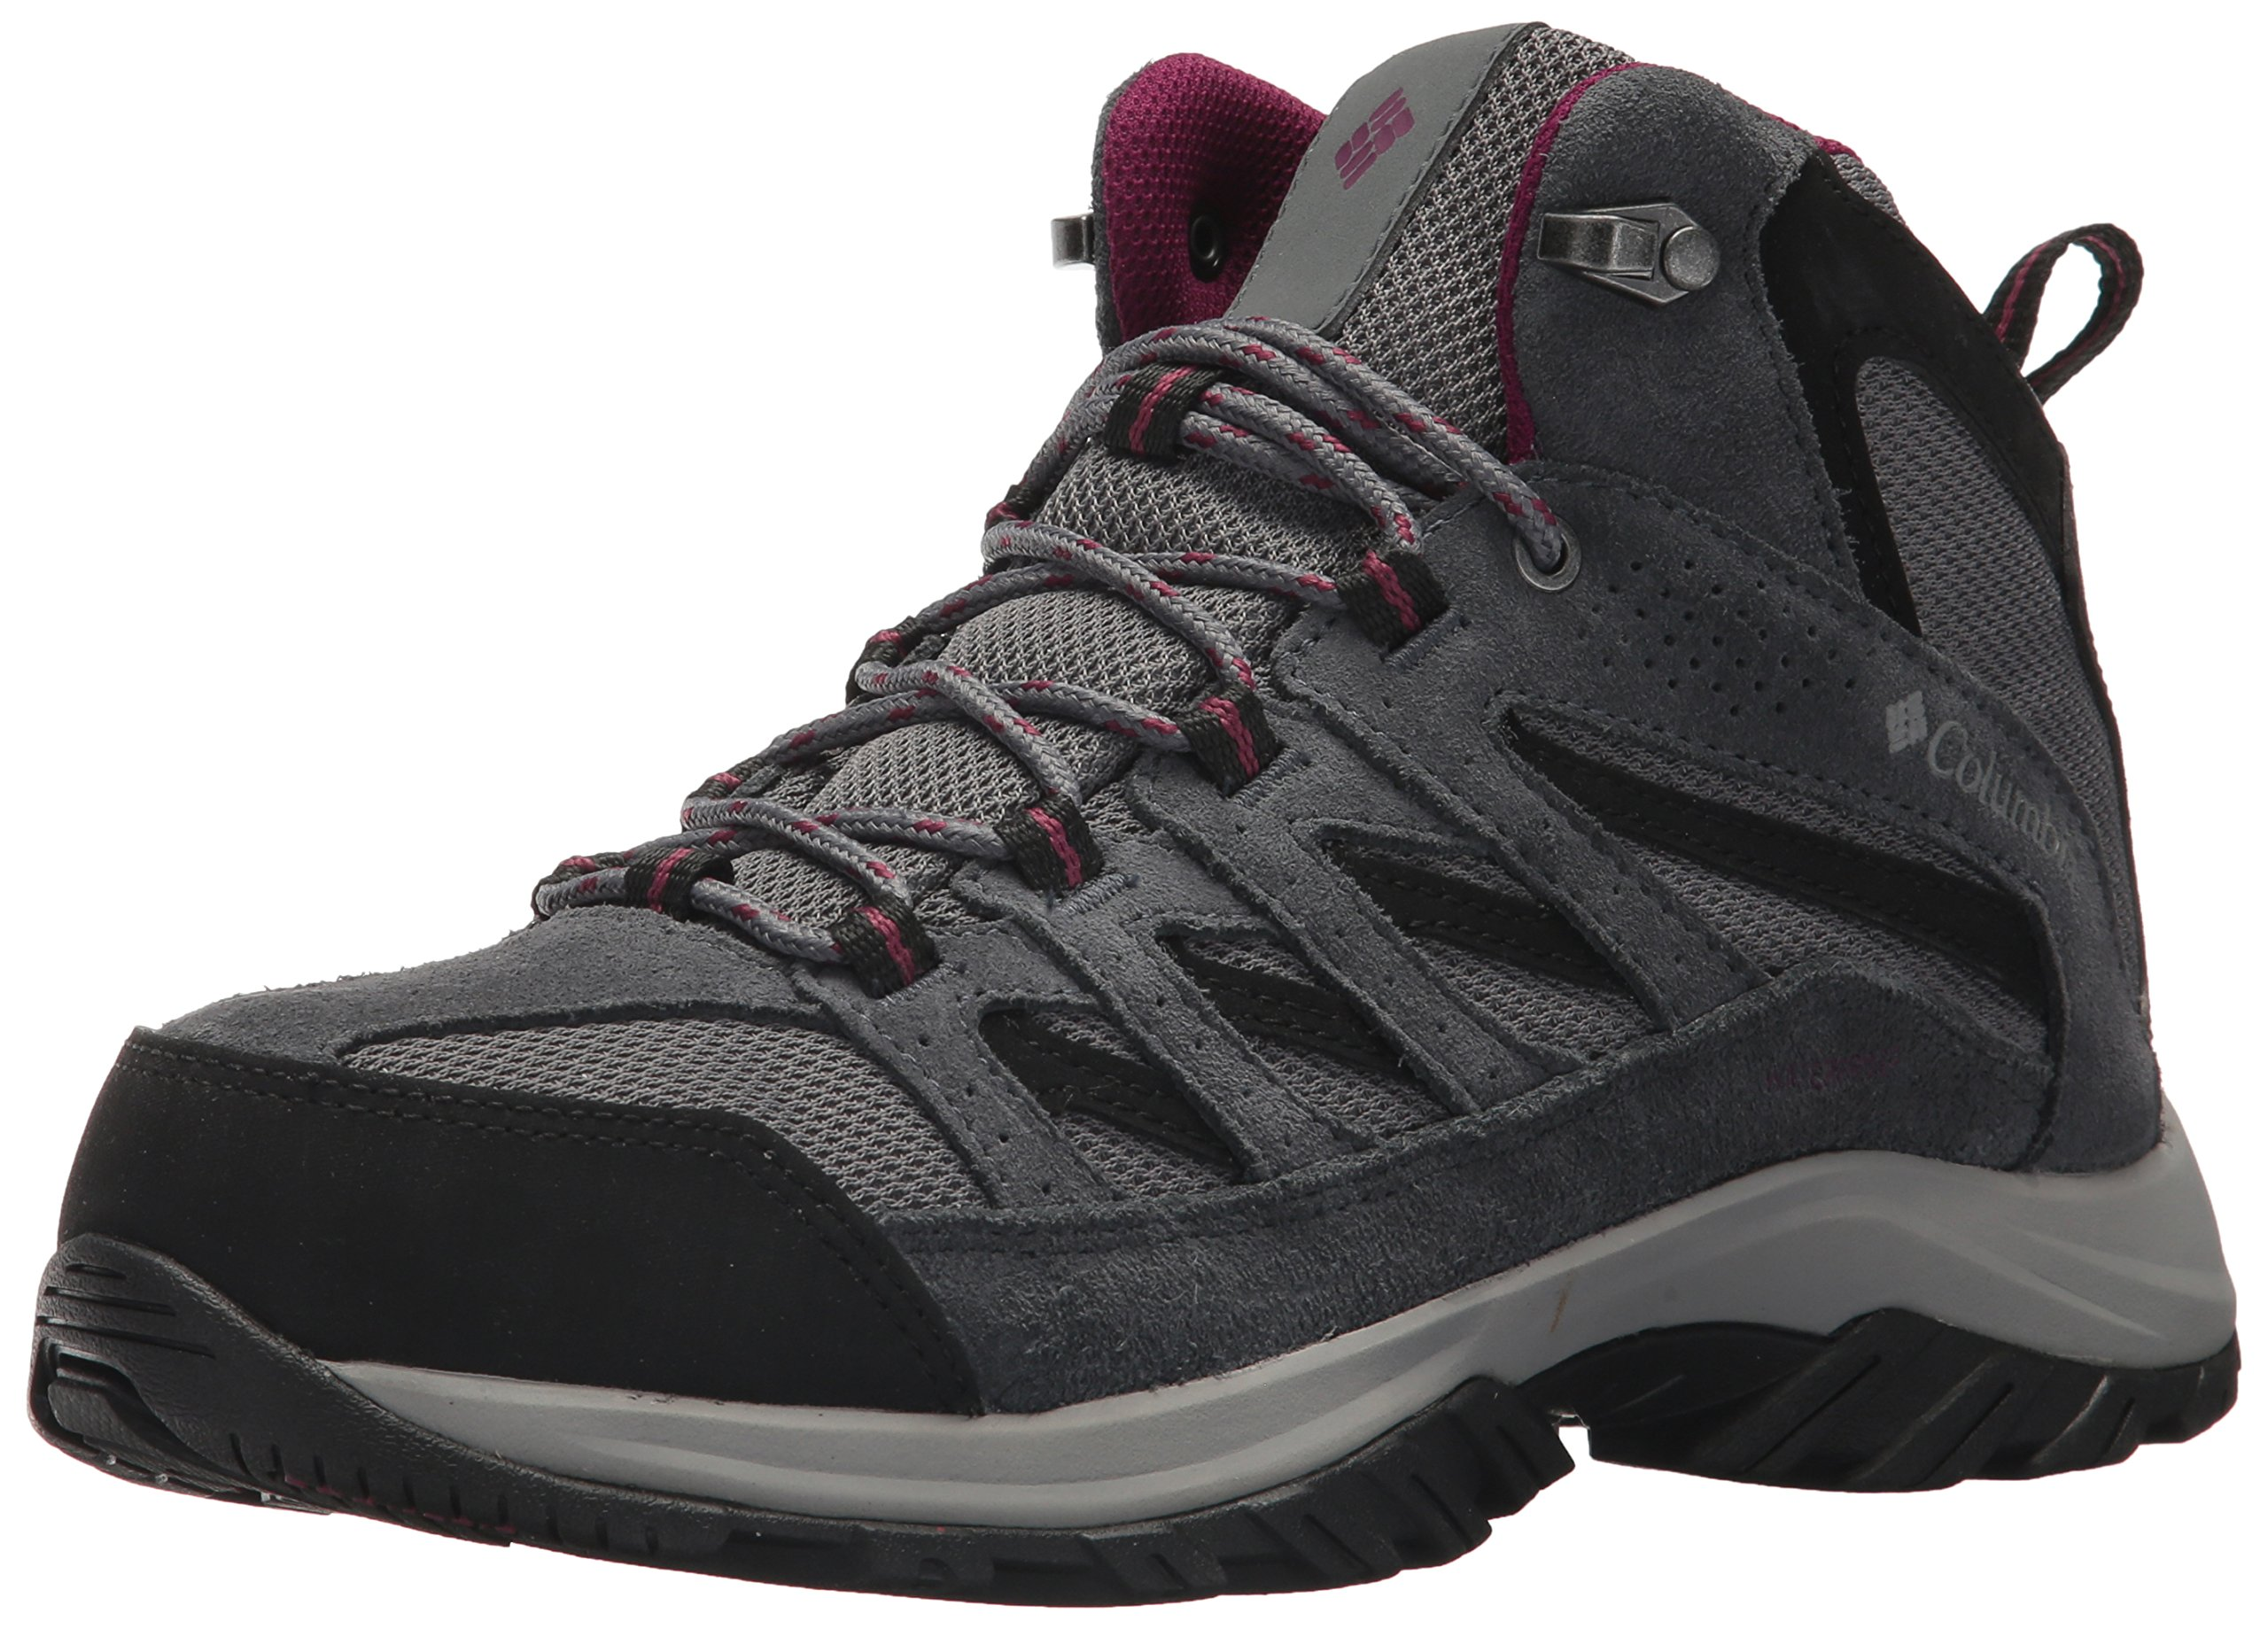 Columbia Women's Crestwood Mid Waterproof Hiking Boot, Ti Grey Steel, Dark Raspberry, 8.5 Regular US